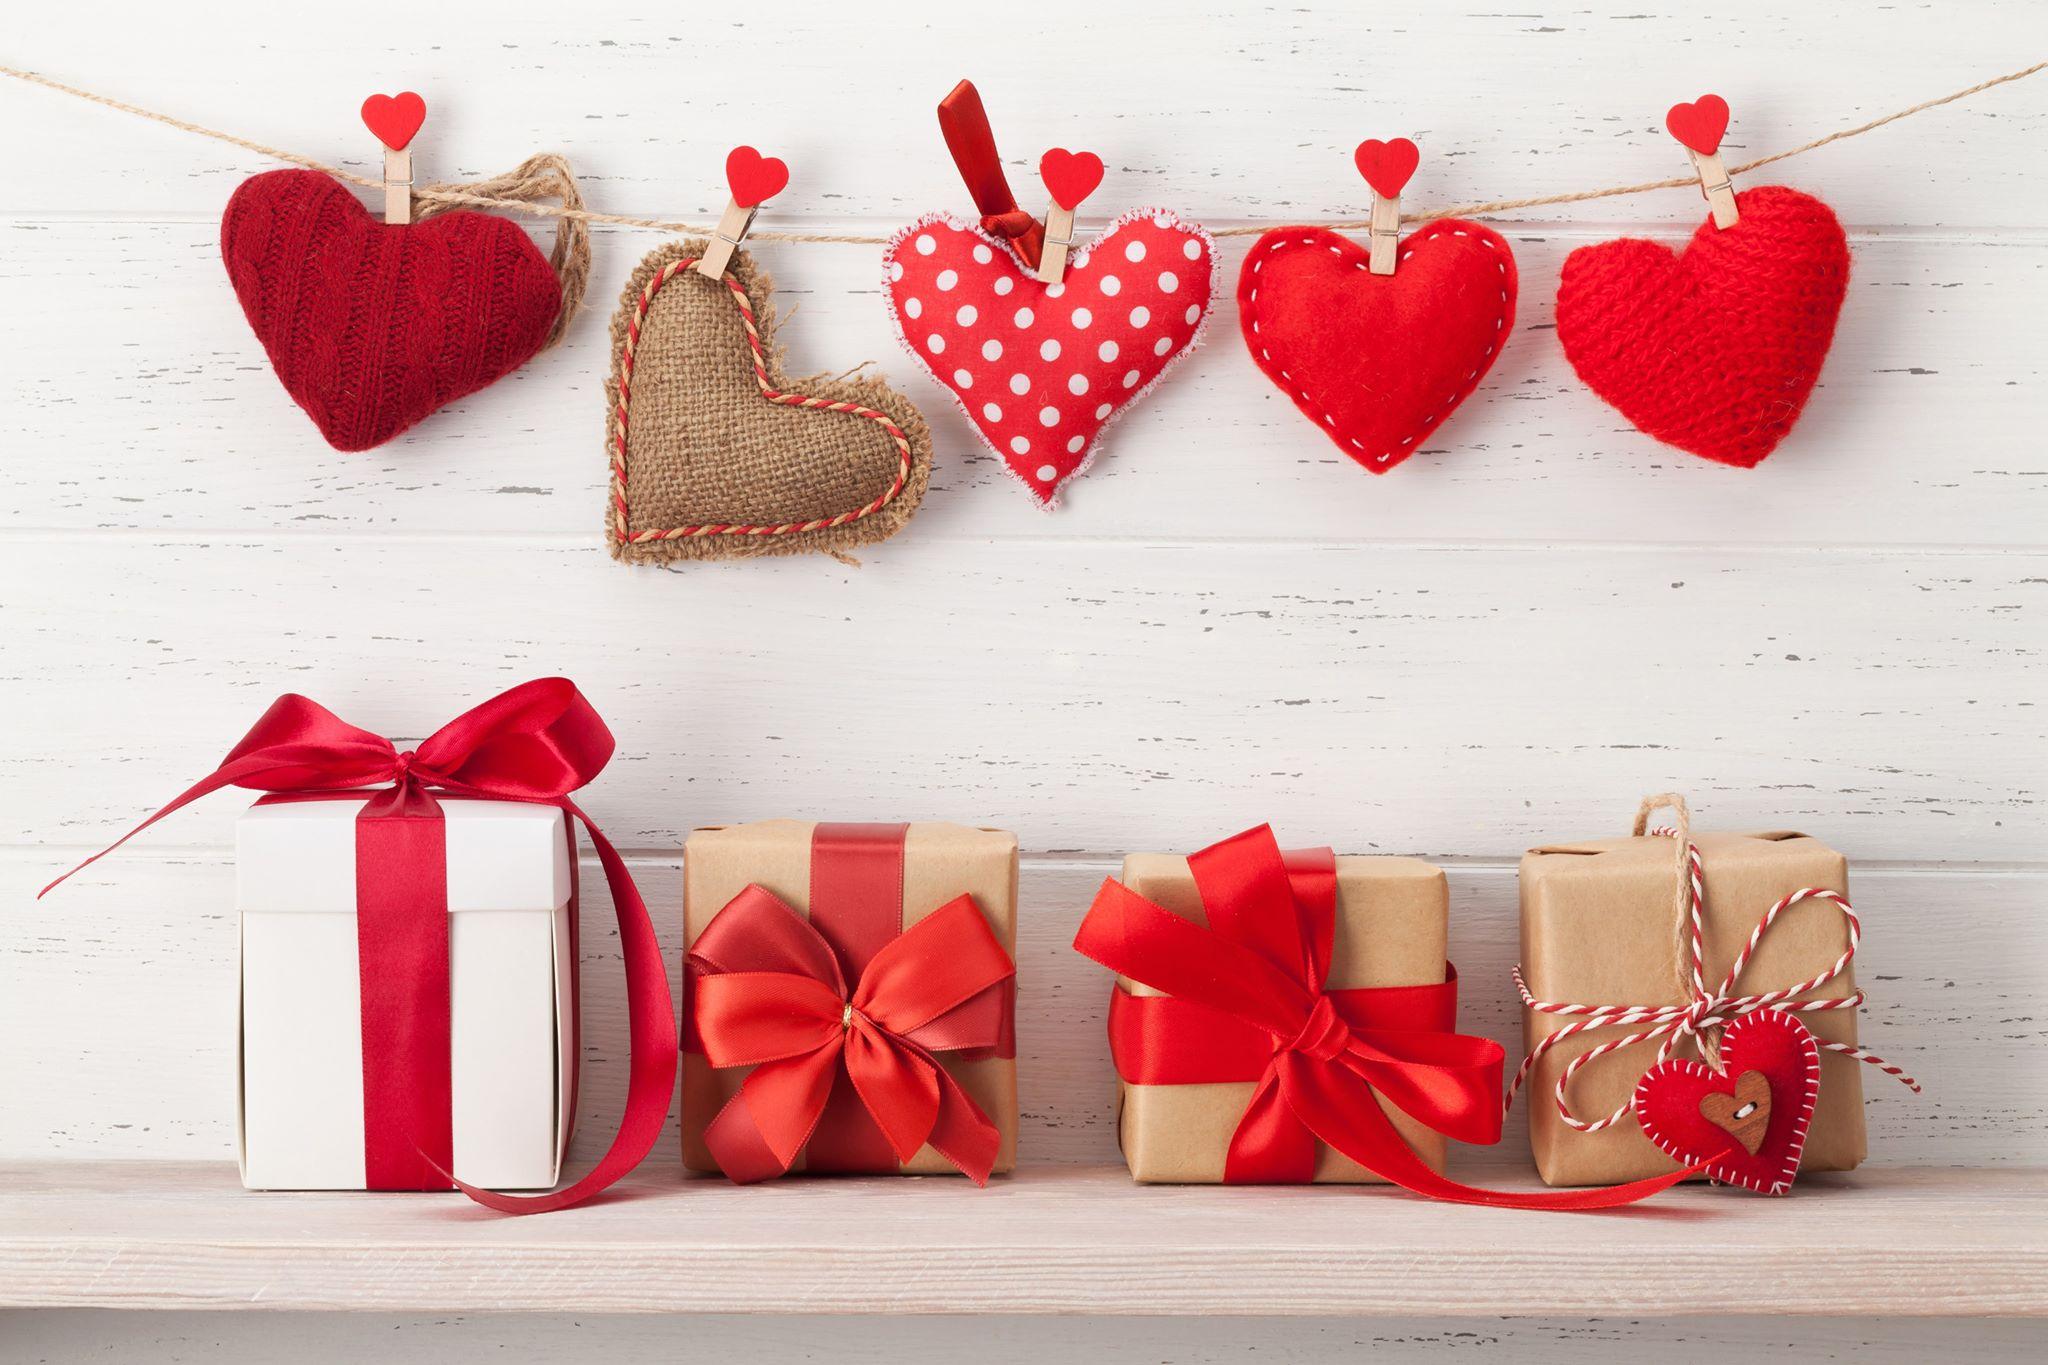 Valentines day images 18 صور عيد الحب